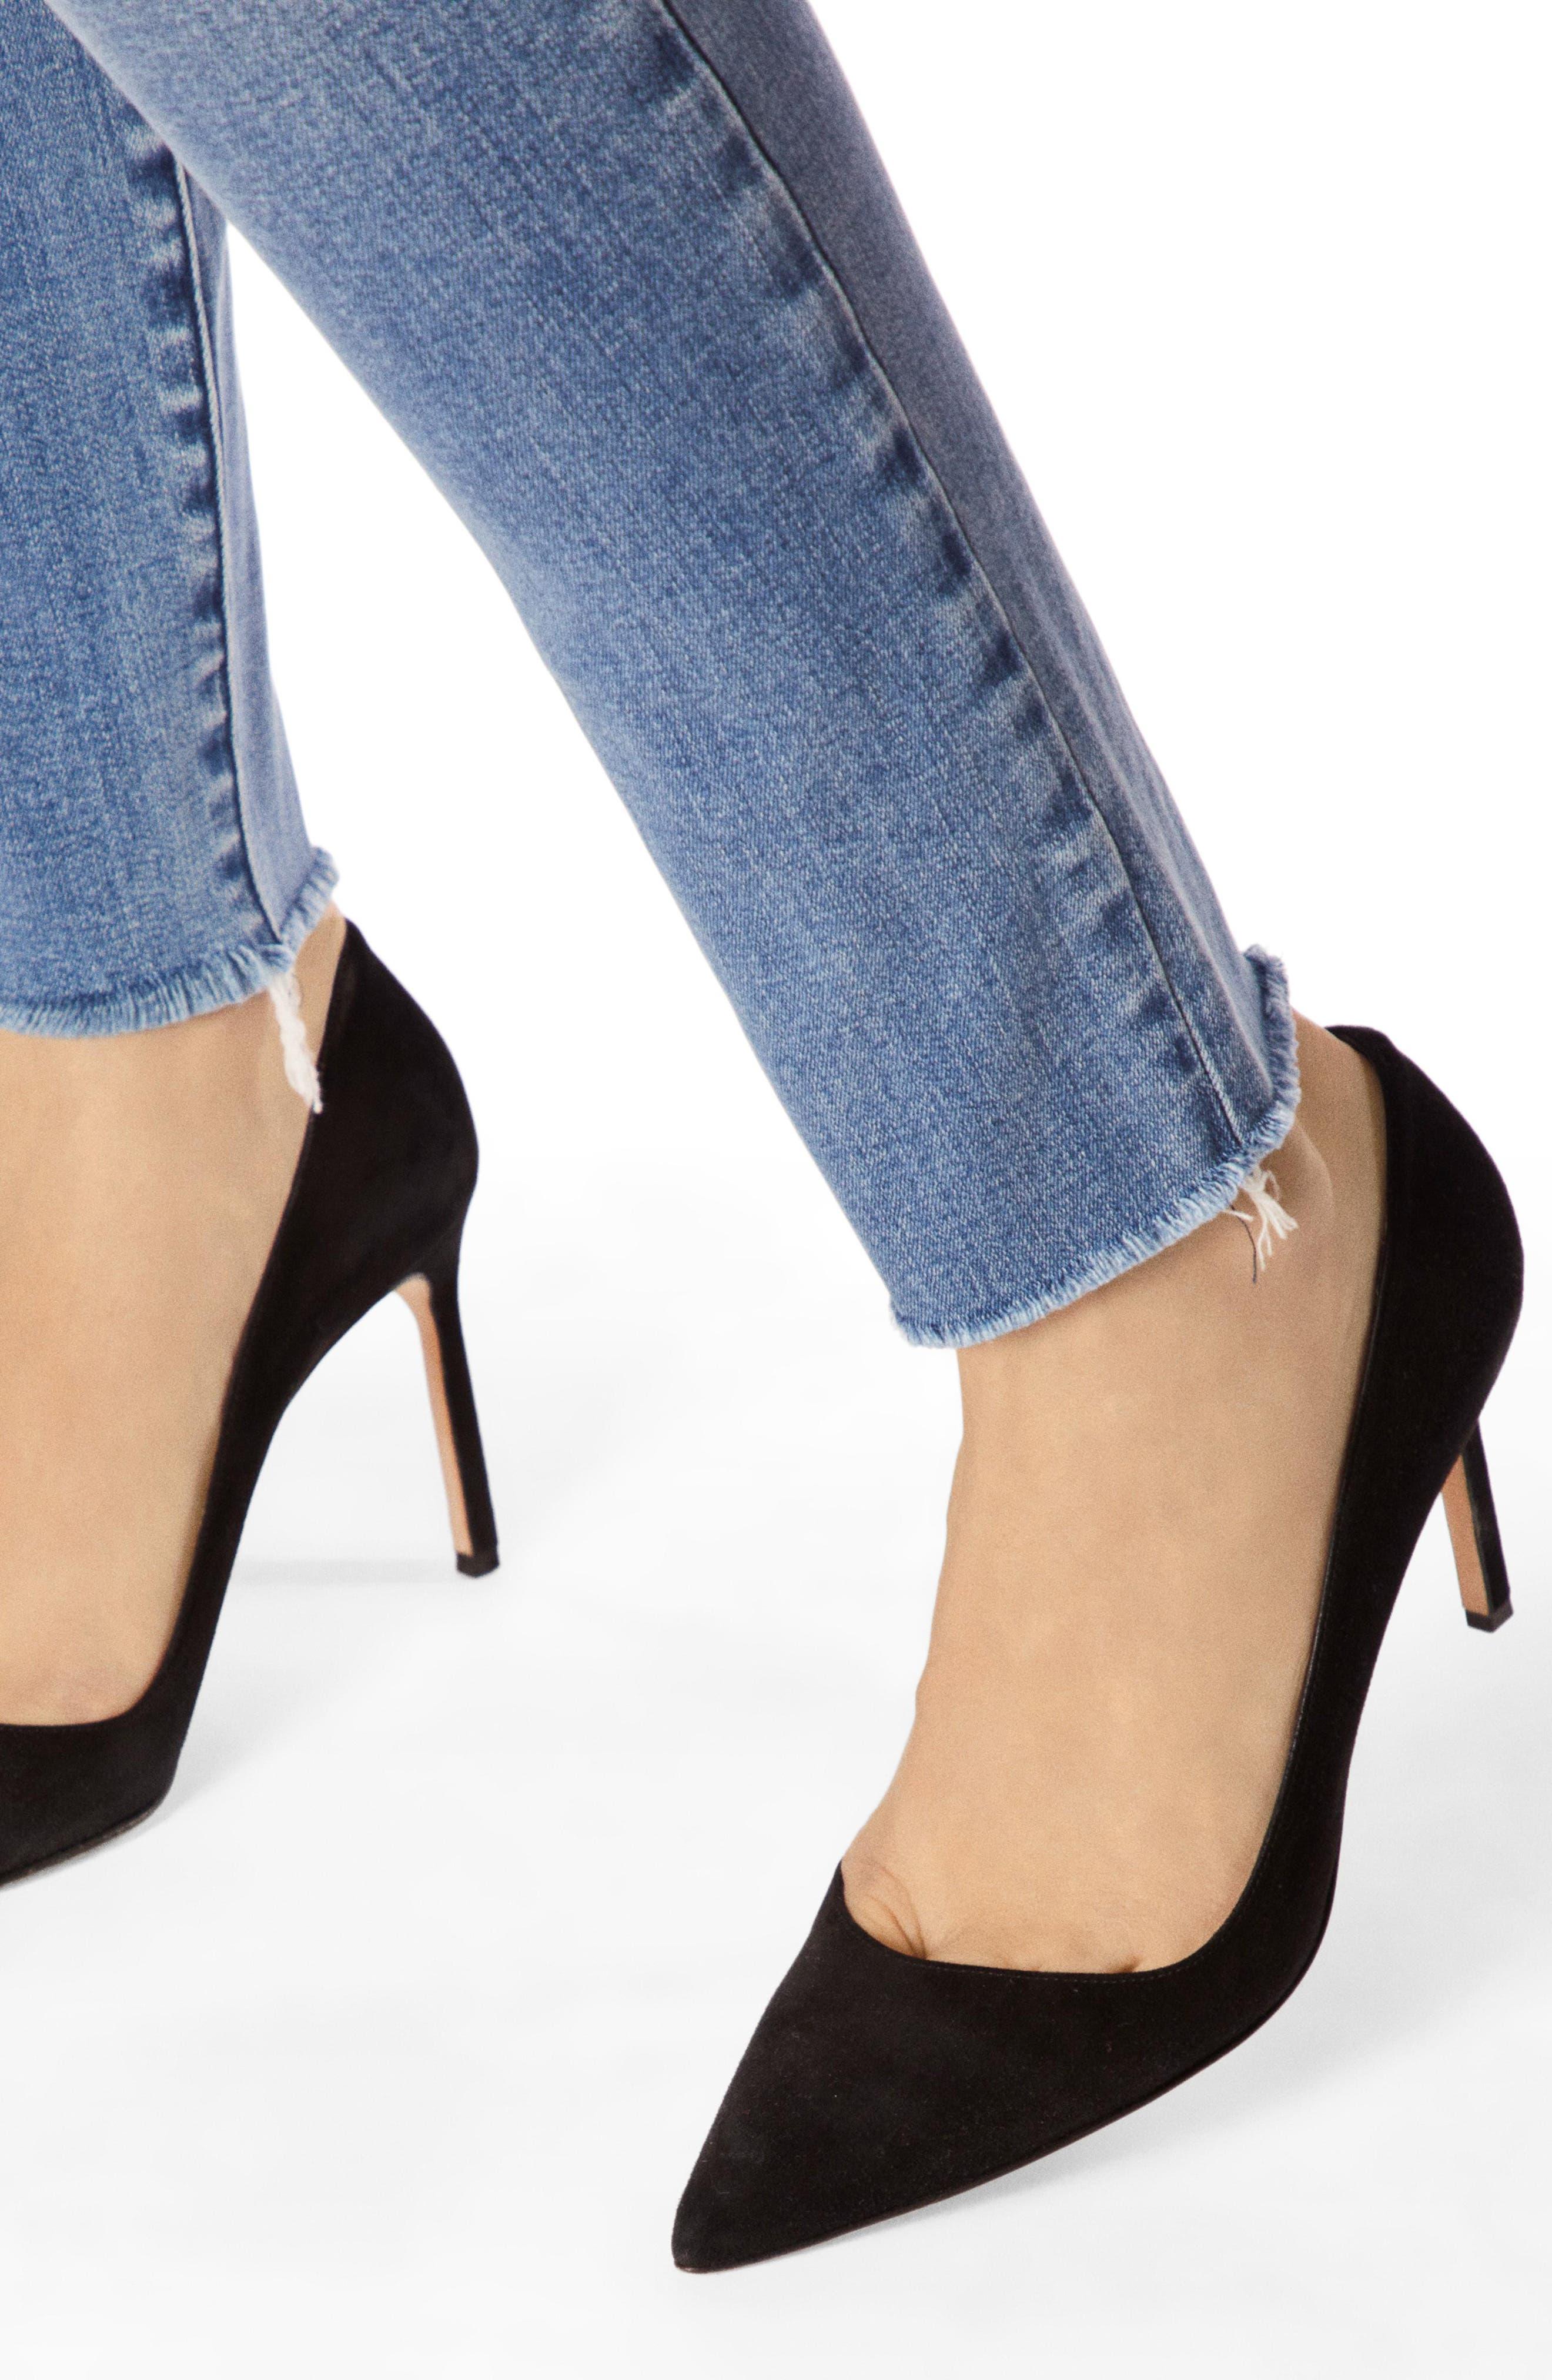 J BRAND, Maria High Waist Raw Hem Skinny Jeans, Alternate thumbnail 3, color, VEGA